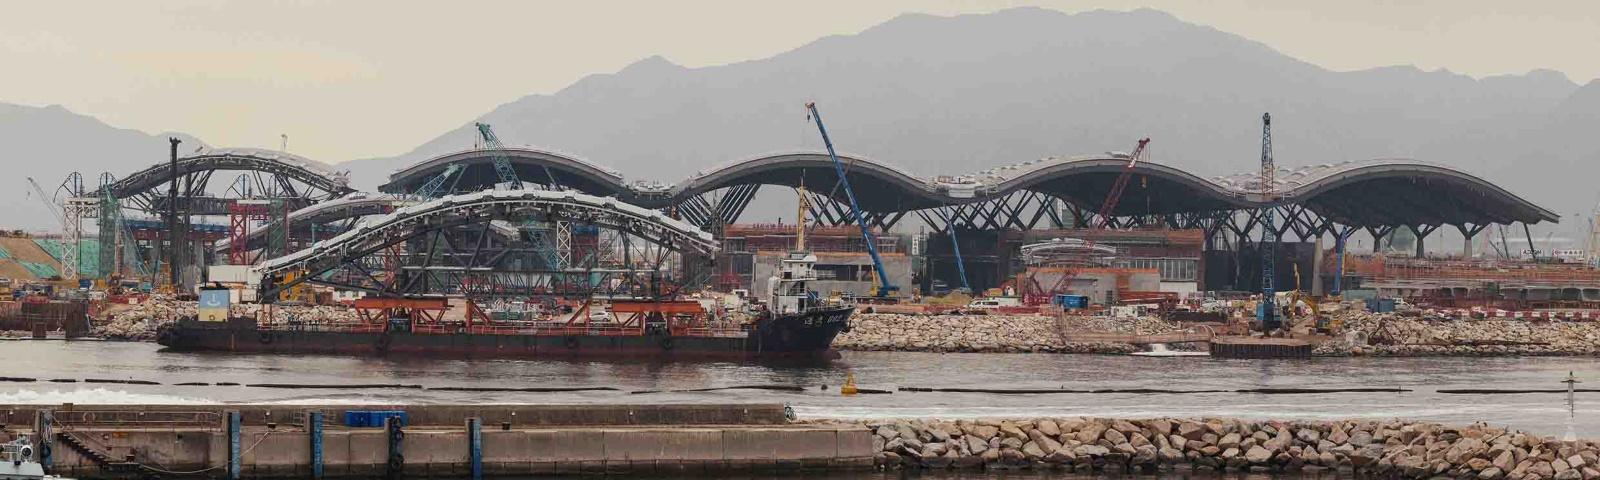 The Border Crossing Facility for the new Hong Kong - Macau - Zhuhai Bridge